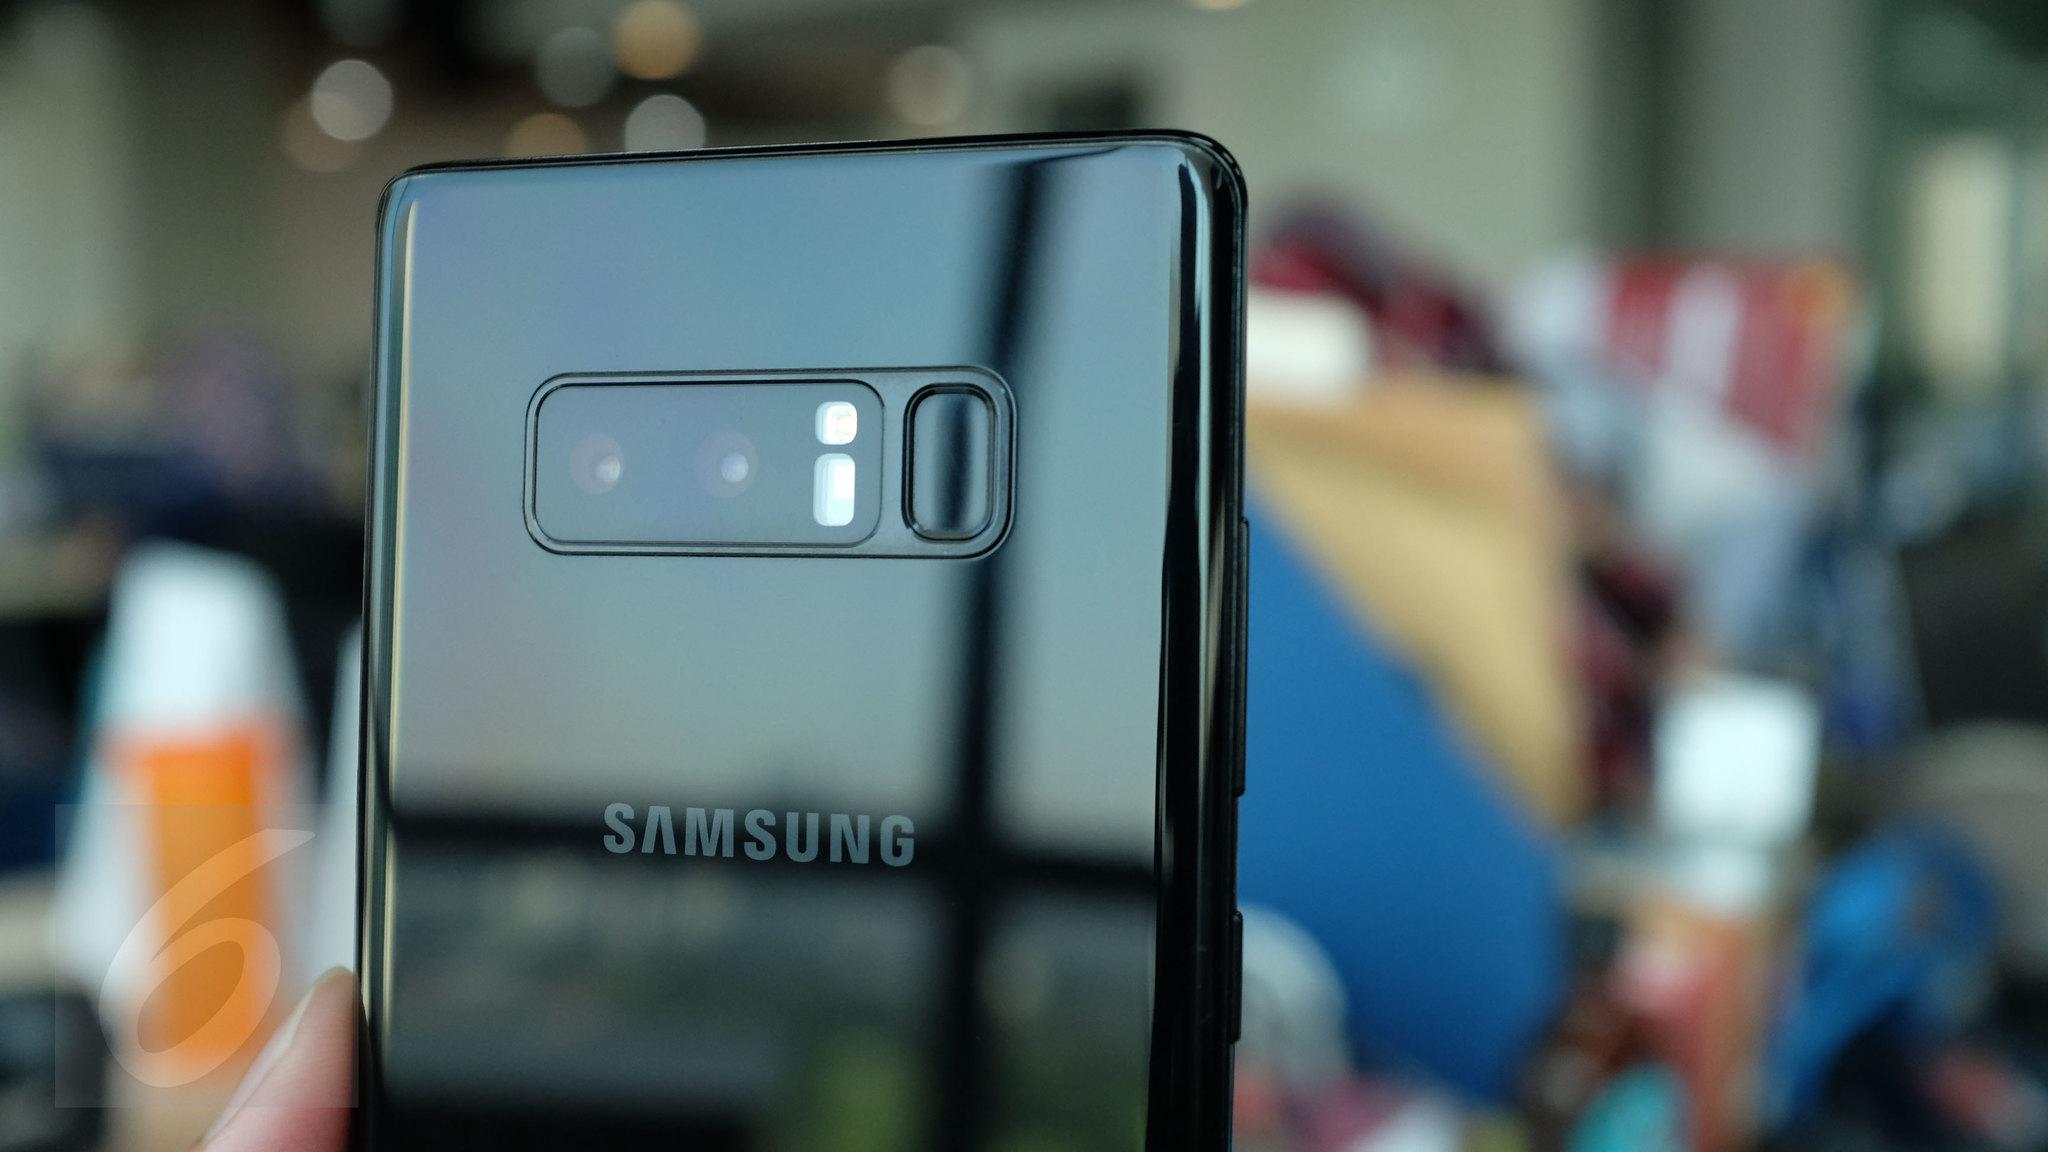 Kamera belakang Galaxy Note 8. Liputan6.com/ Iskandar